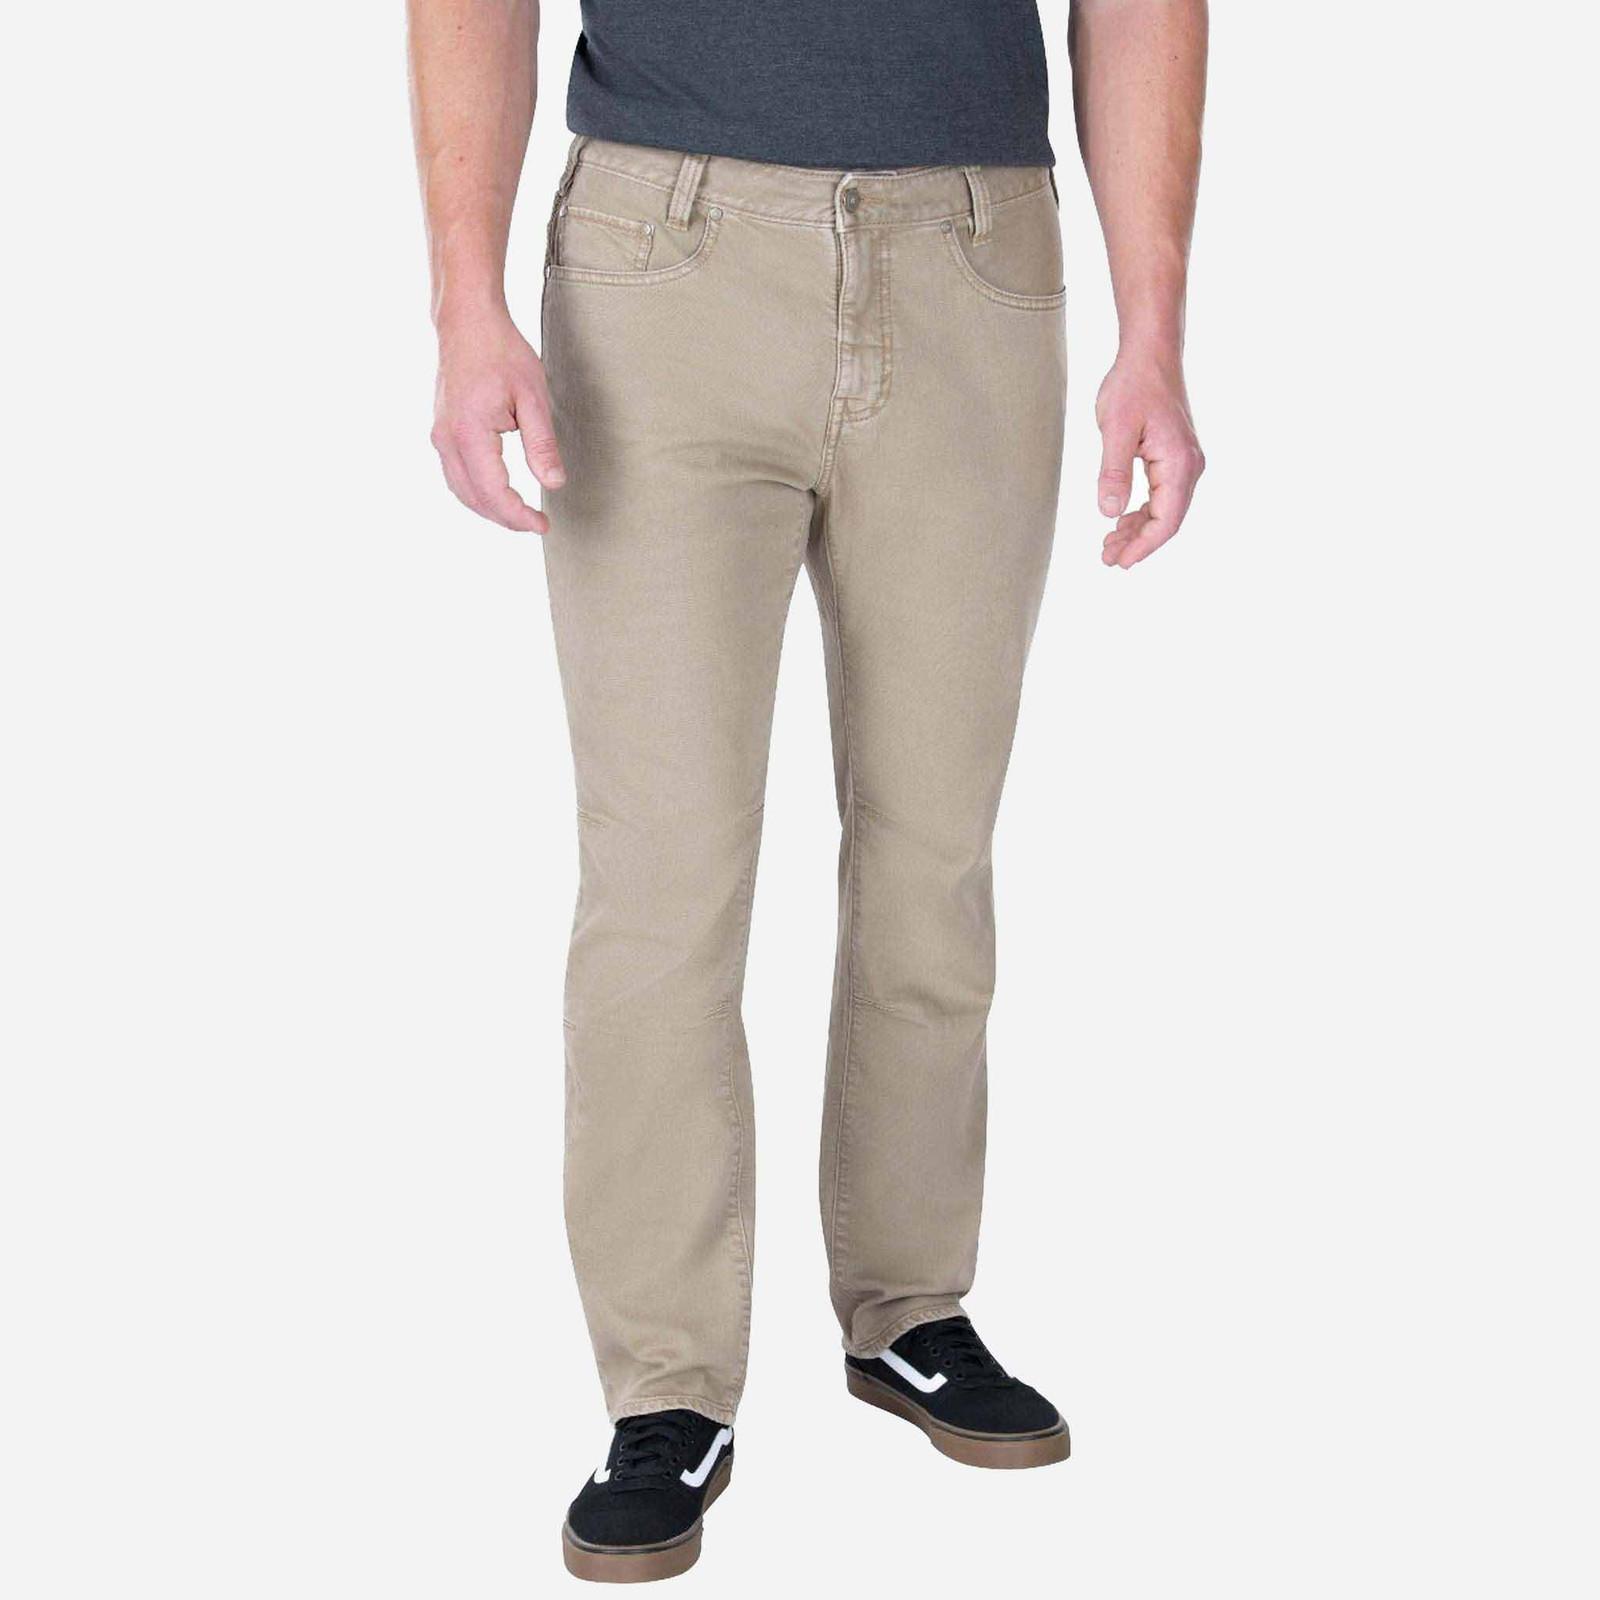 Defiance Jeans - Sandstorm - Vertx